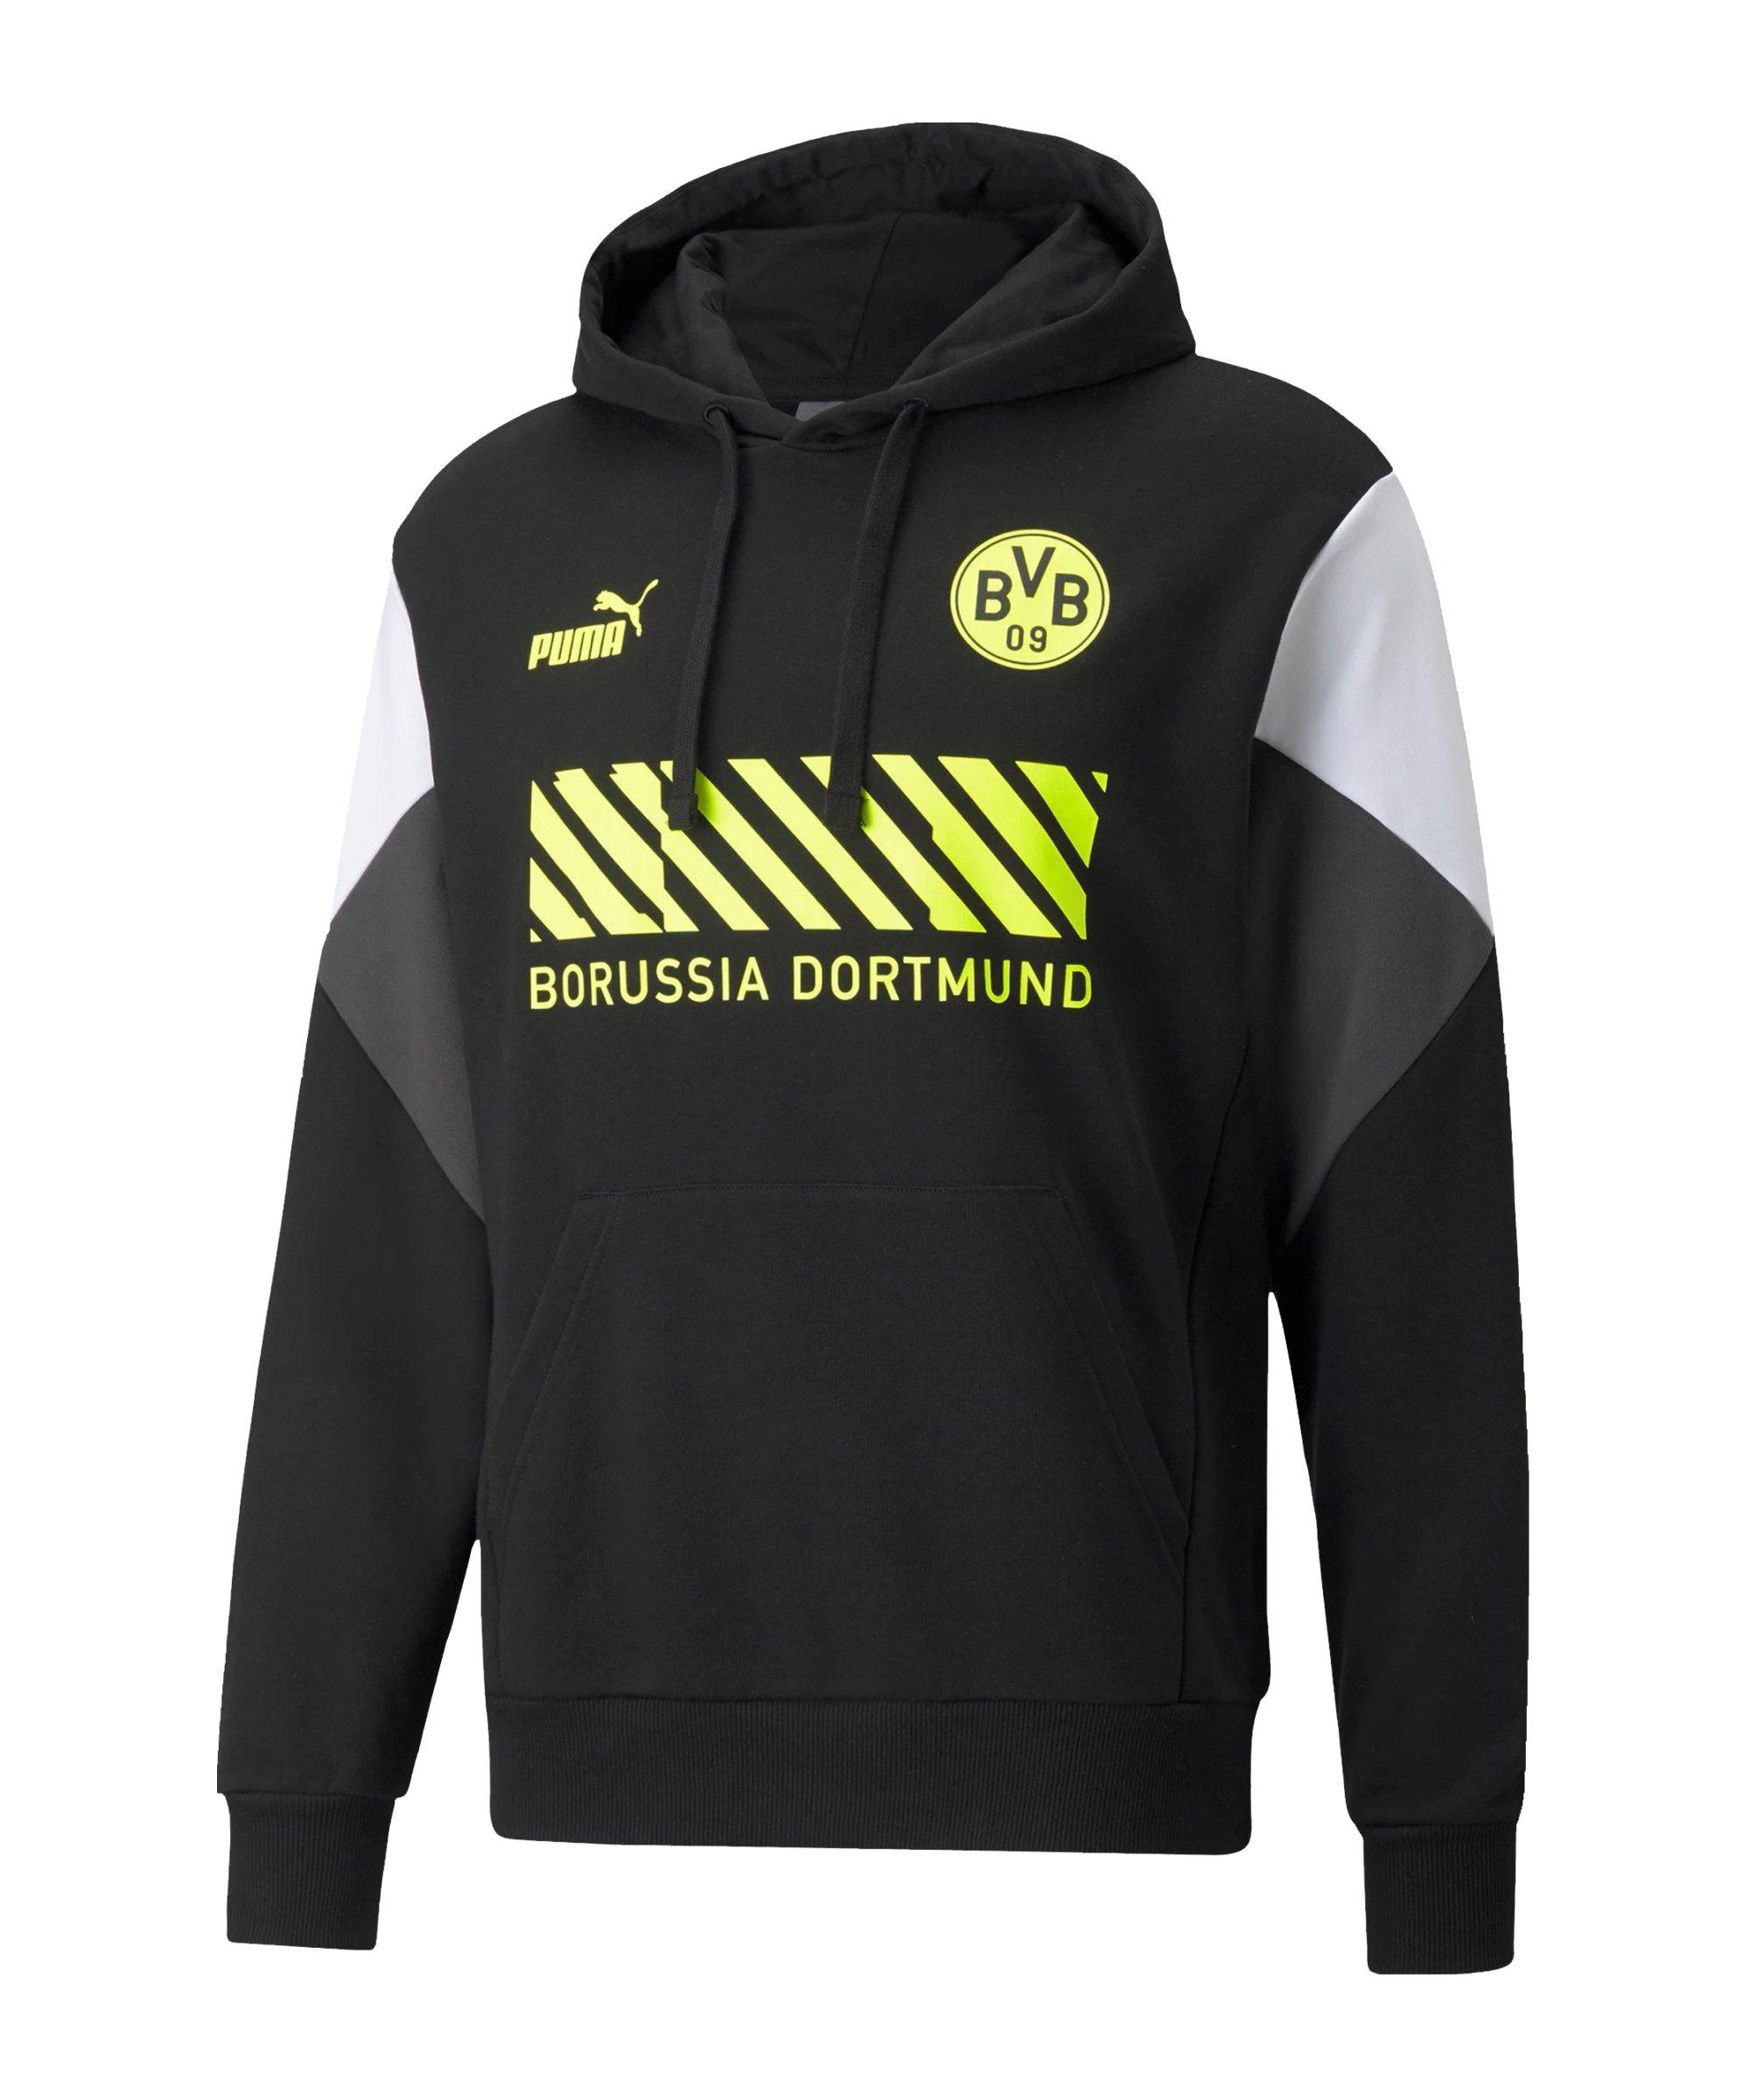 PUMA BVB Dortmund FtblCulture Hoody Schwarz F05 - schwarz